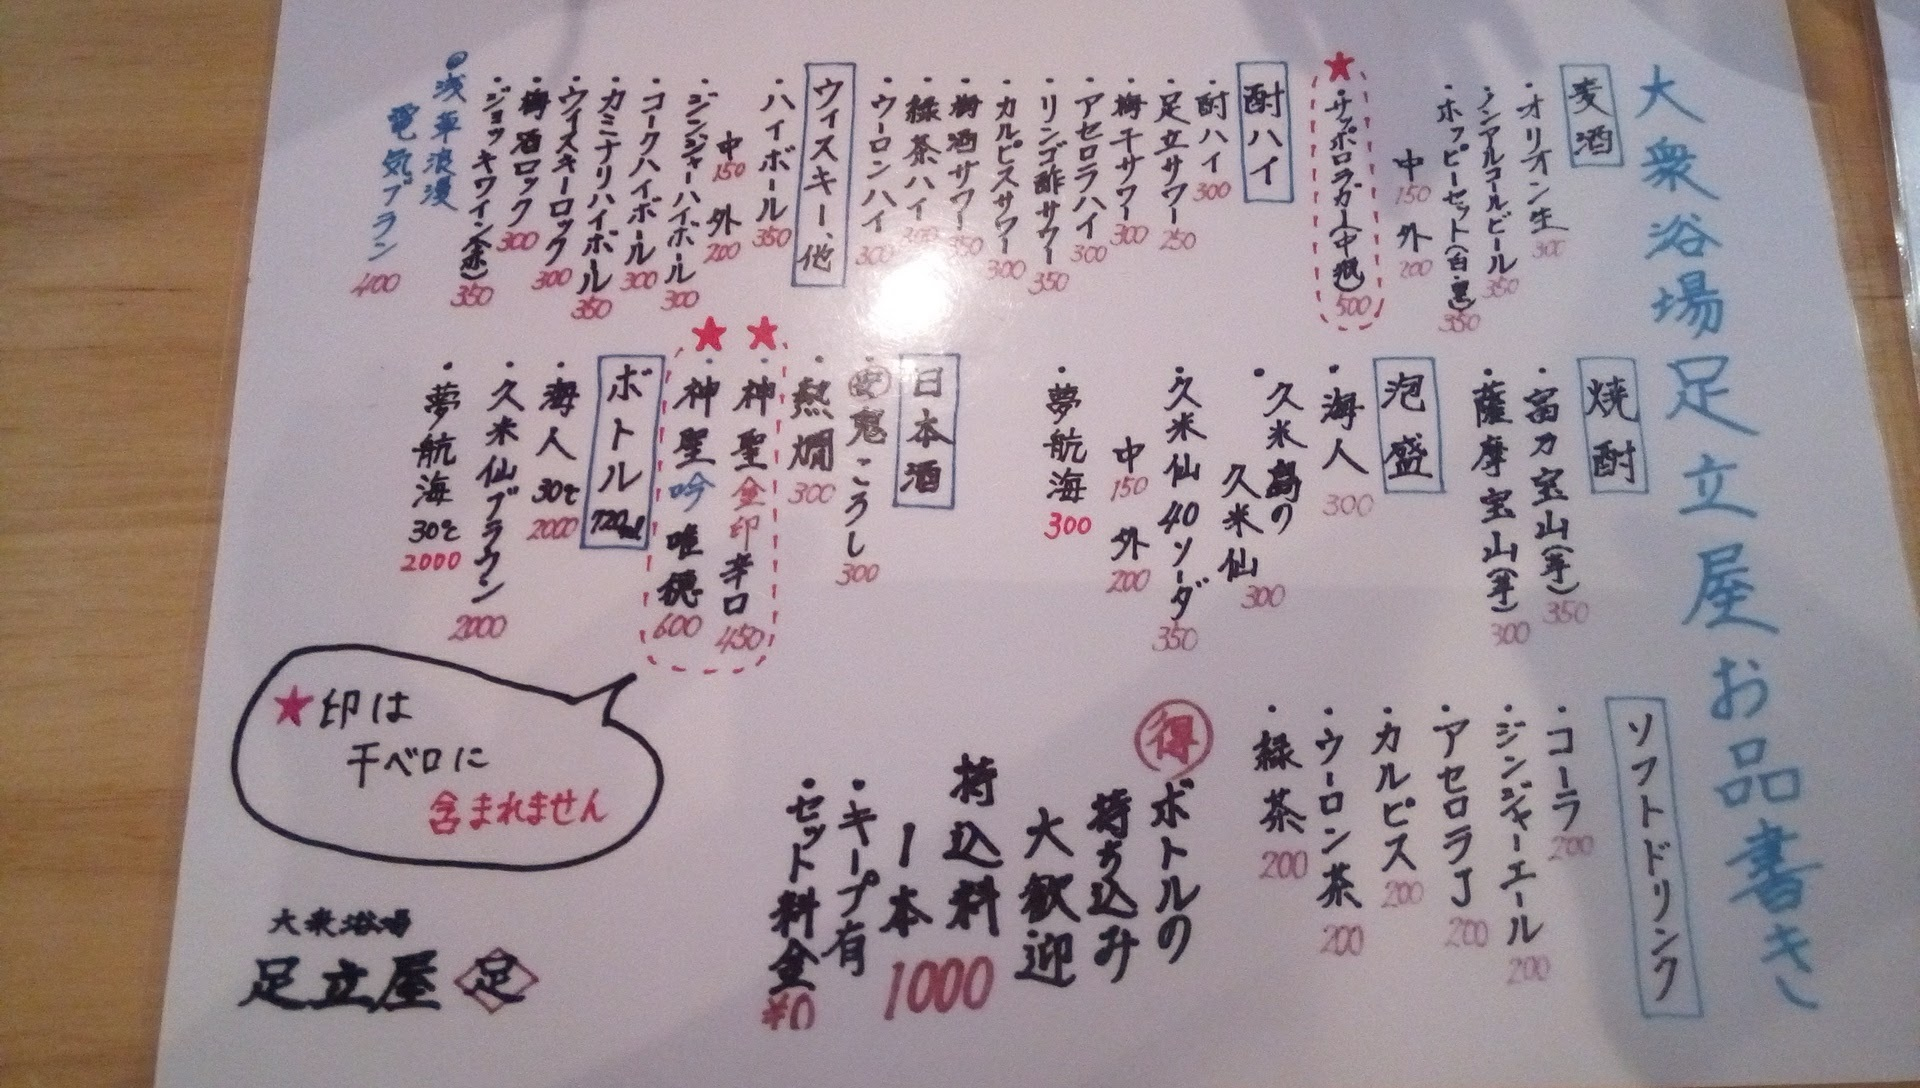 The drink menu of Adachiya